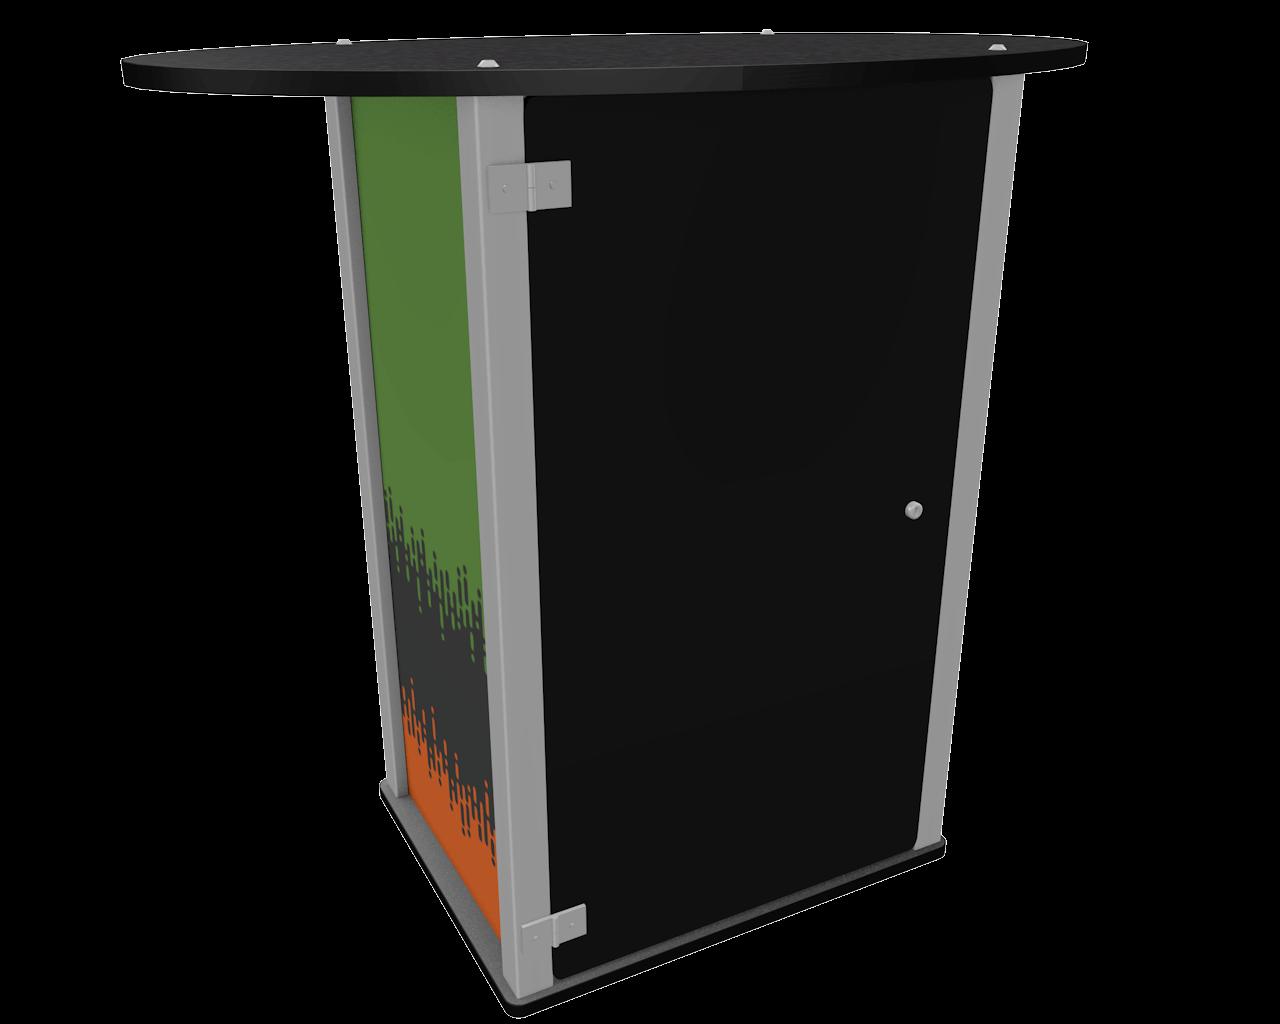 Exhibitline LC1-T2 Locking Counter